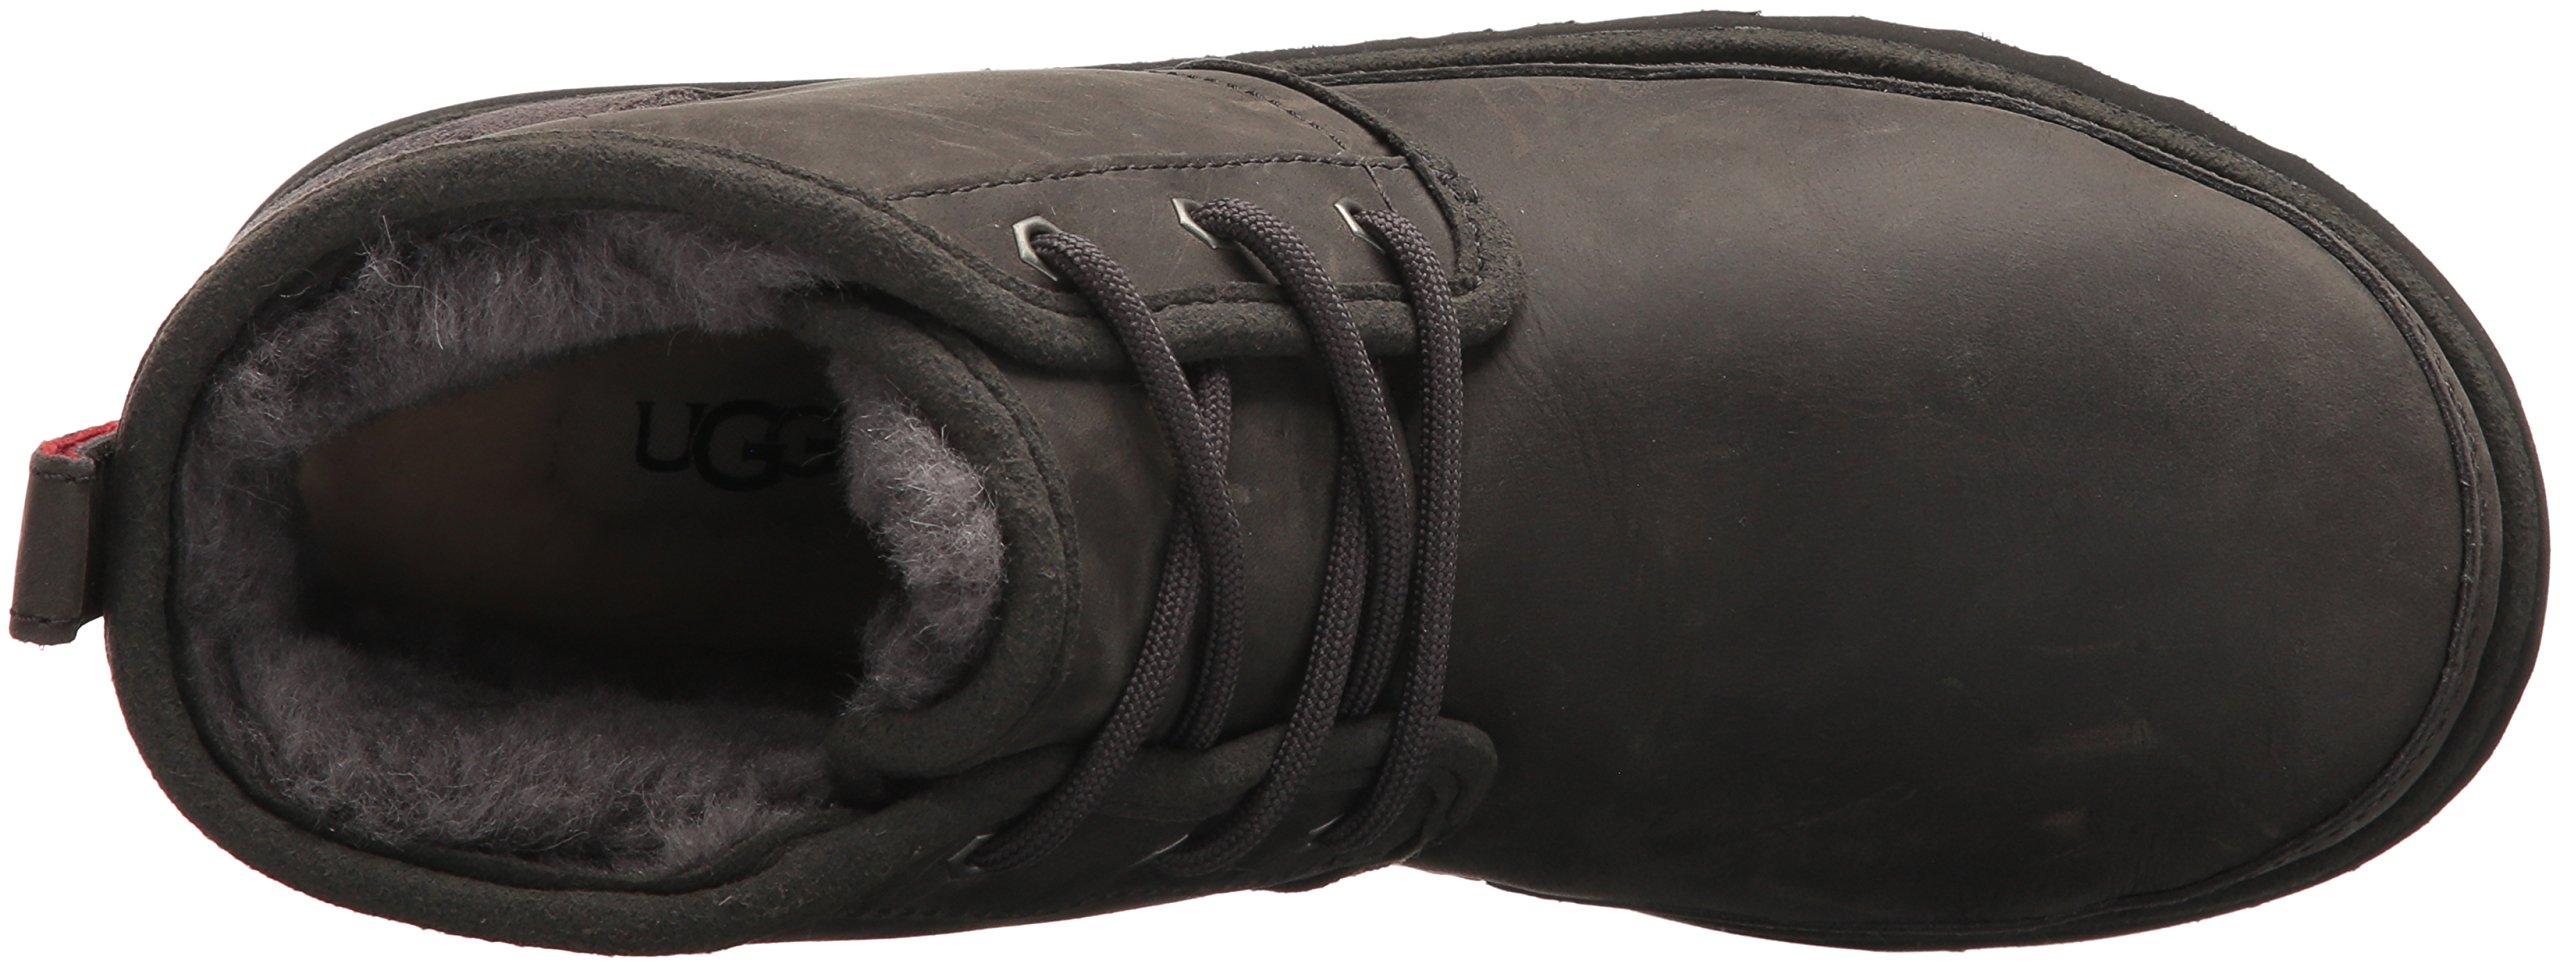 UGG Kids K Neumel II WP Pull-on Boot, Charcoal, 6 M US Big Kid by UGG (Image #8)